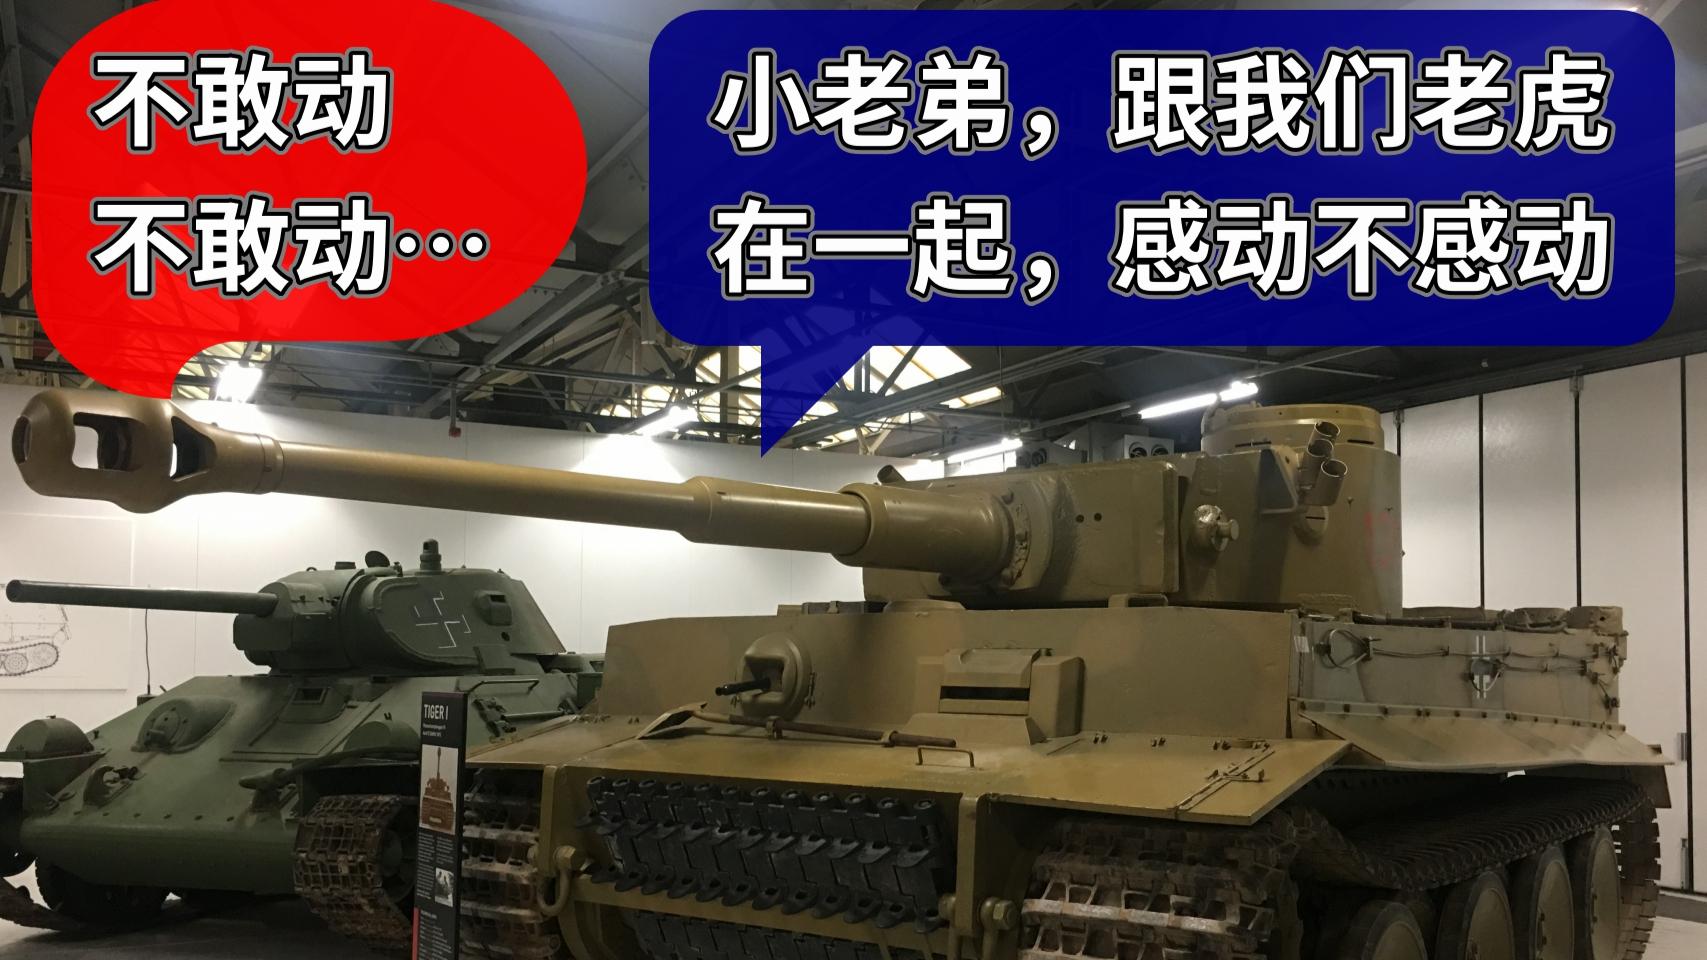 "UP主带你近距离欣赏博文顿坦克博物馆的""虎区"":虎式、虎王和猎虎"